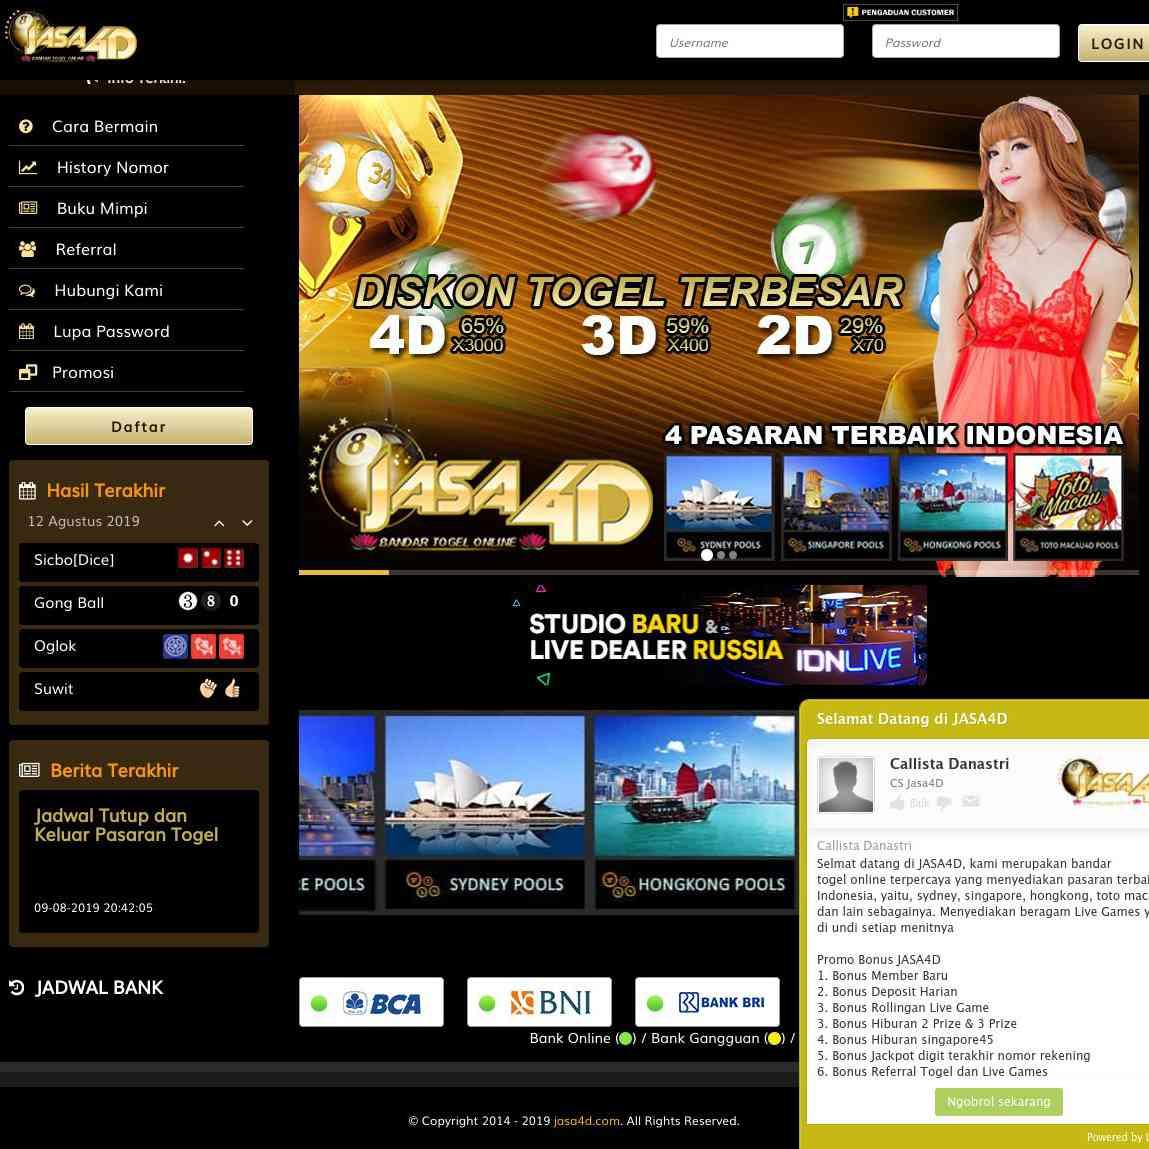 Jasa4d Bandar Togel Online Terpercaya